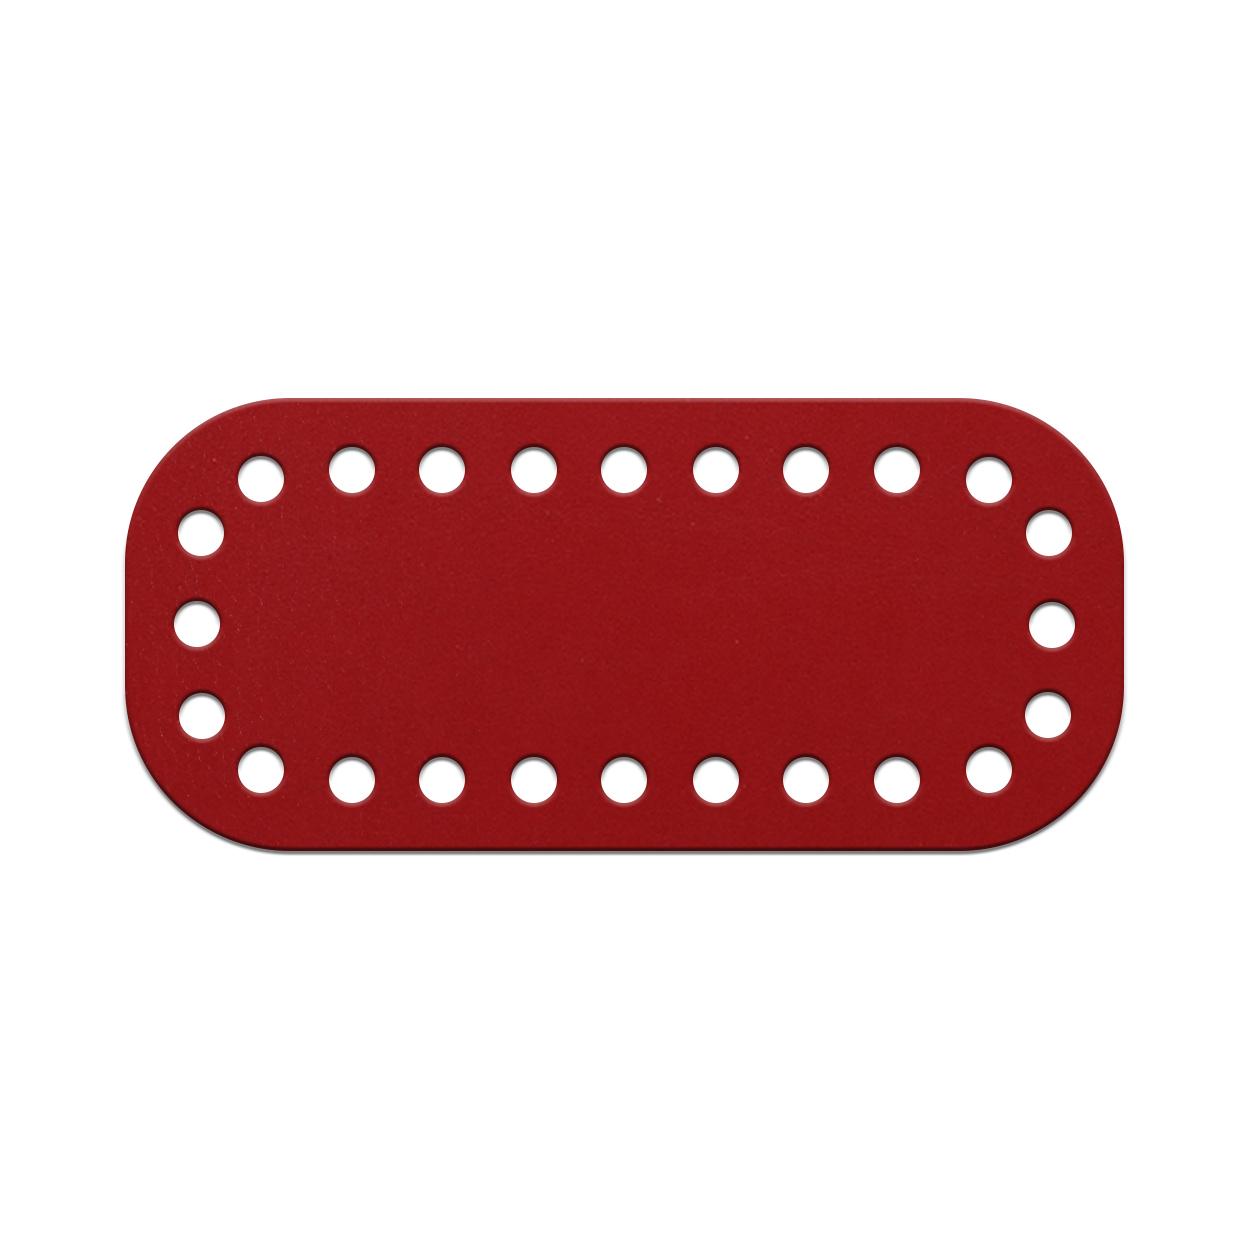 Кожа - Дно для сумки мини 5 х 11 см. Red hot